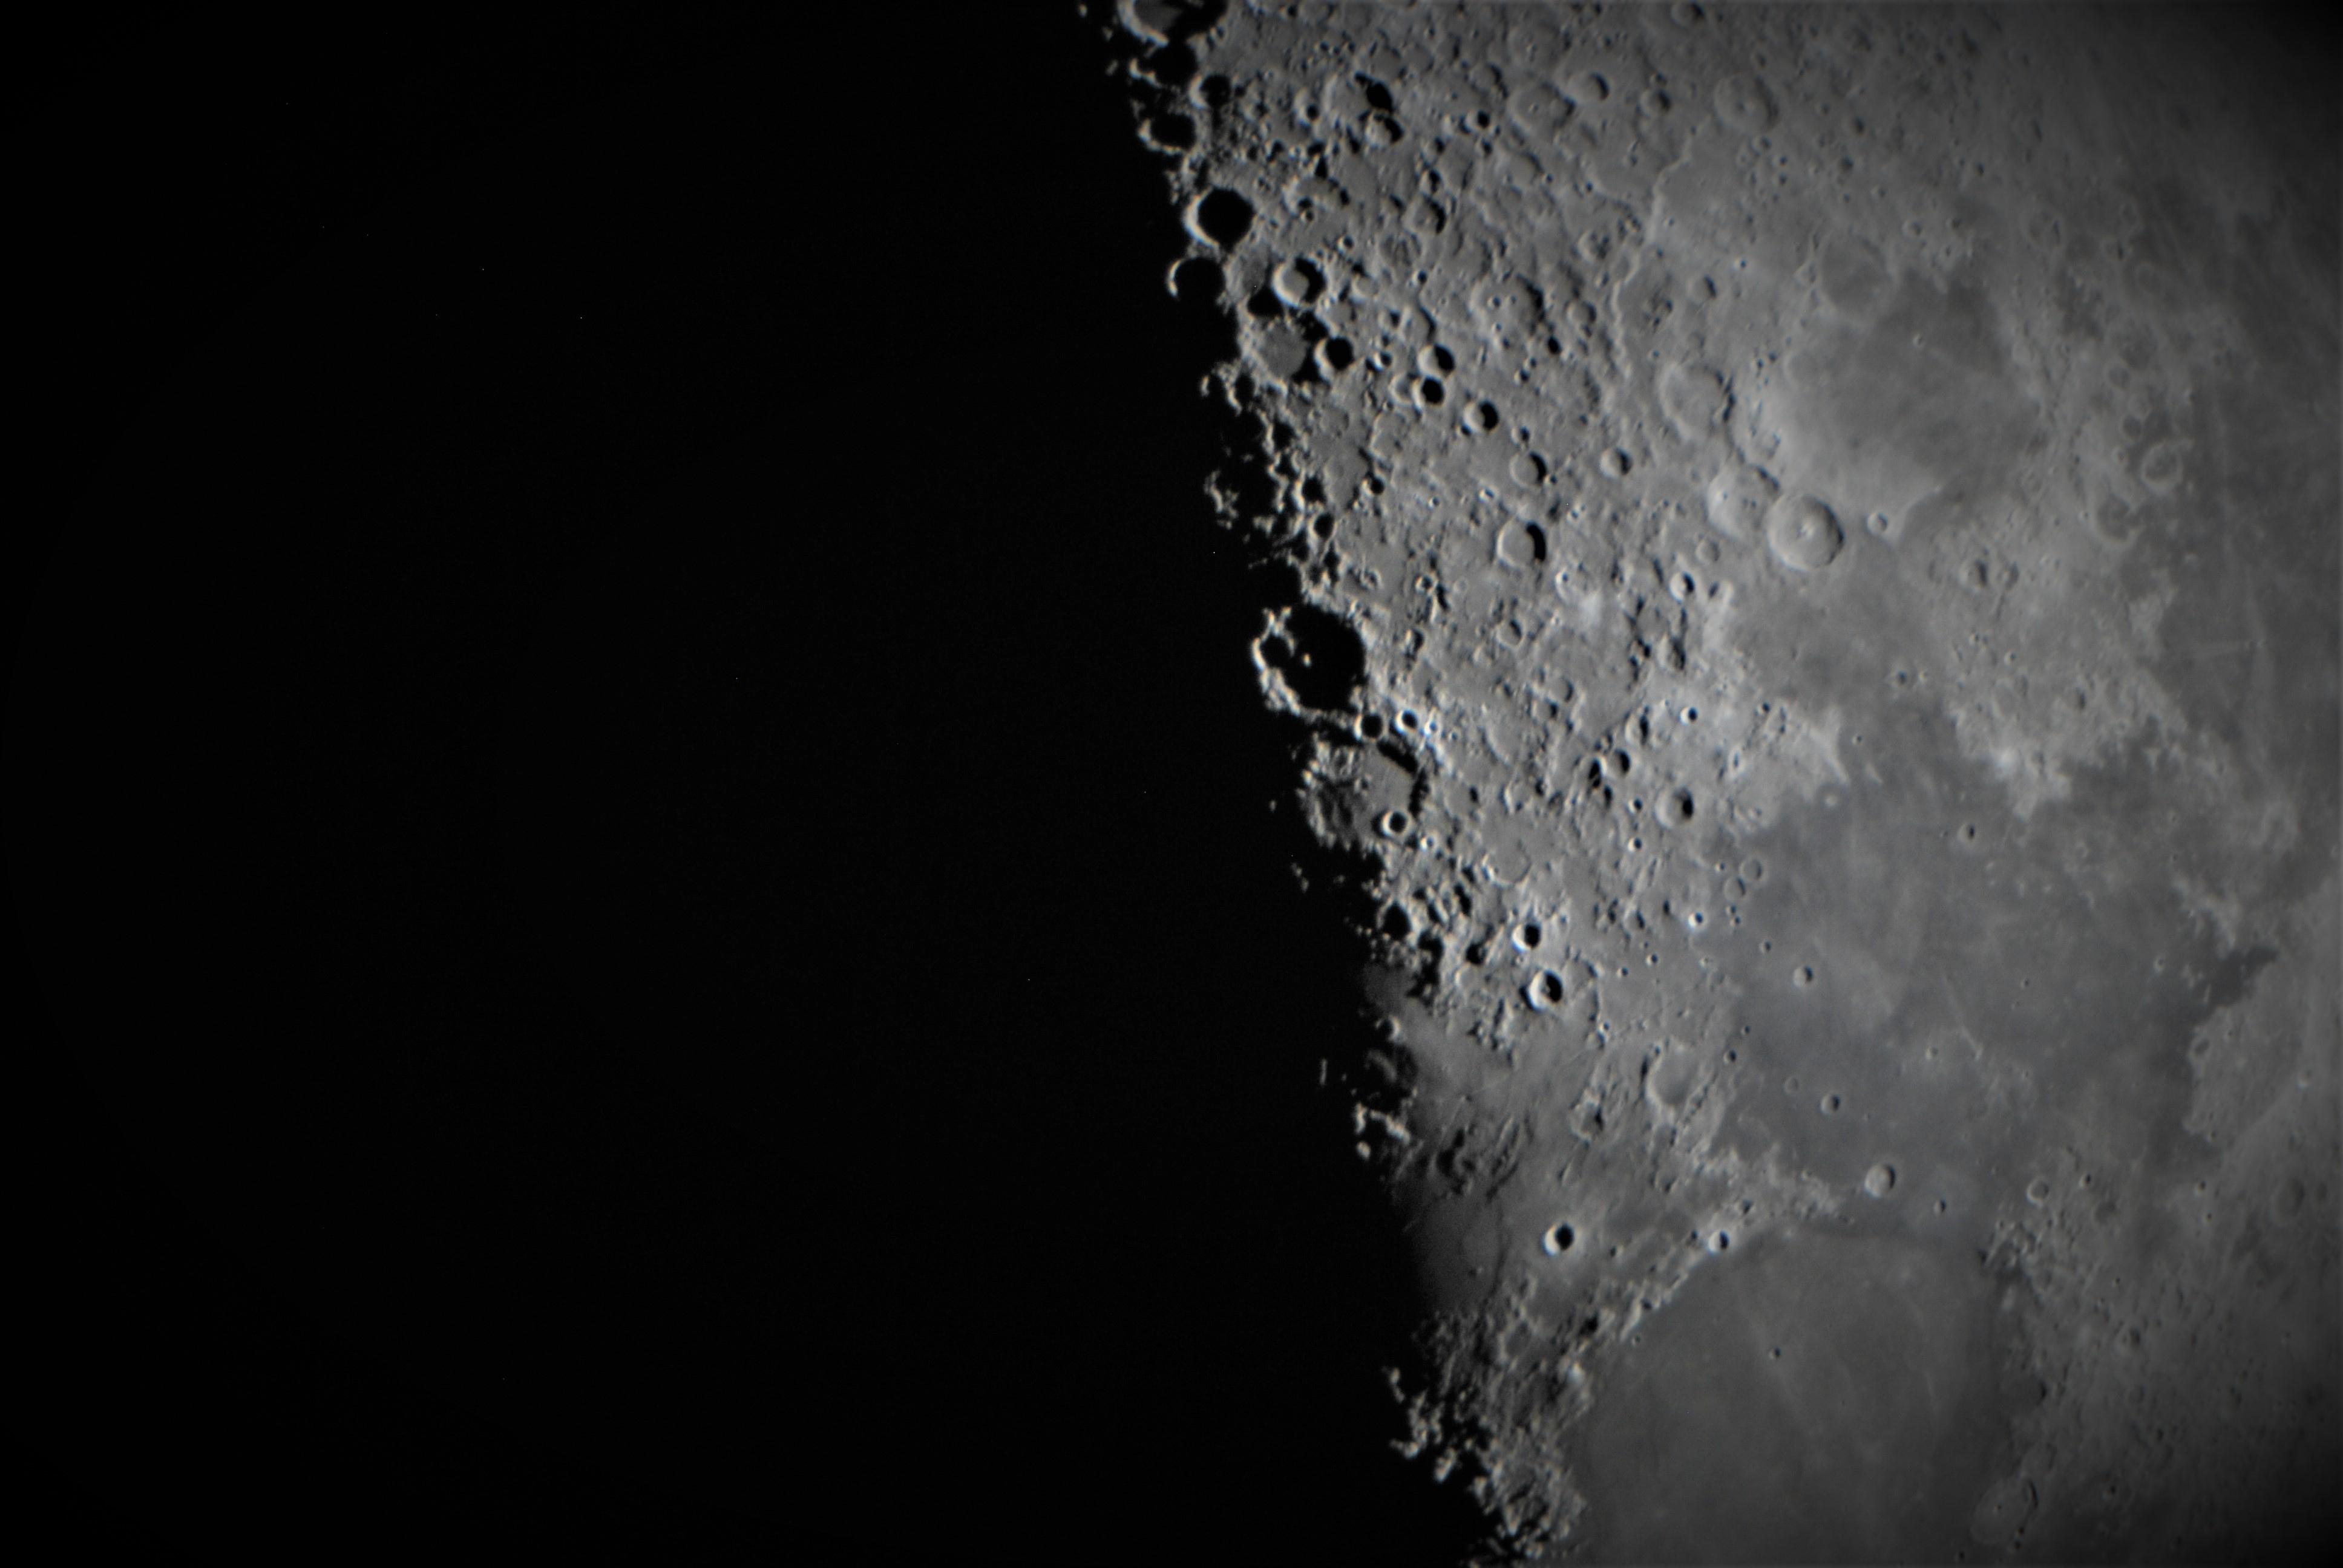 Lune .JPG